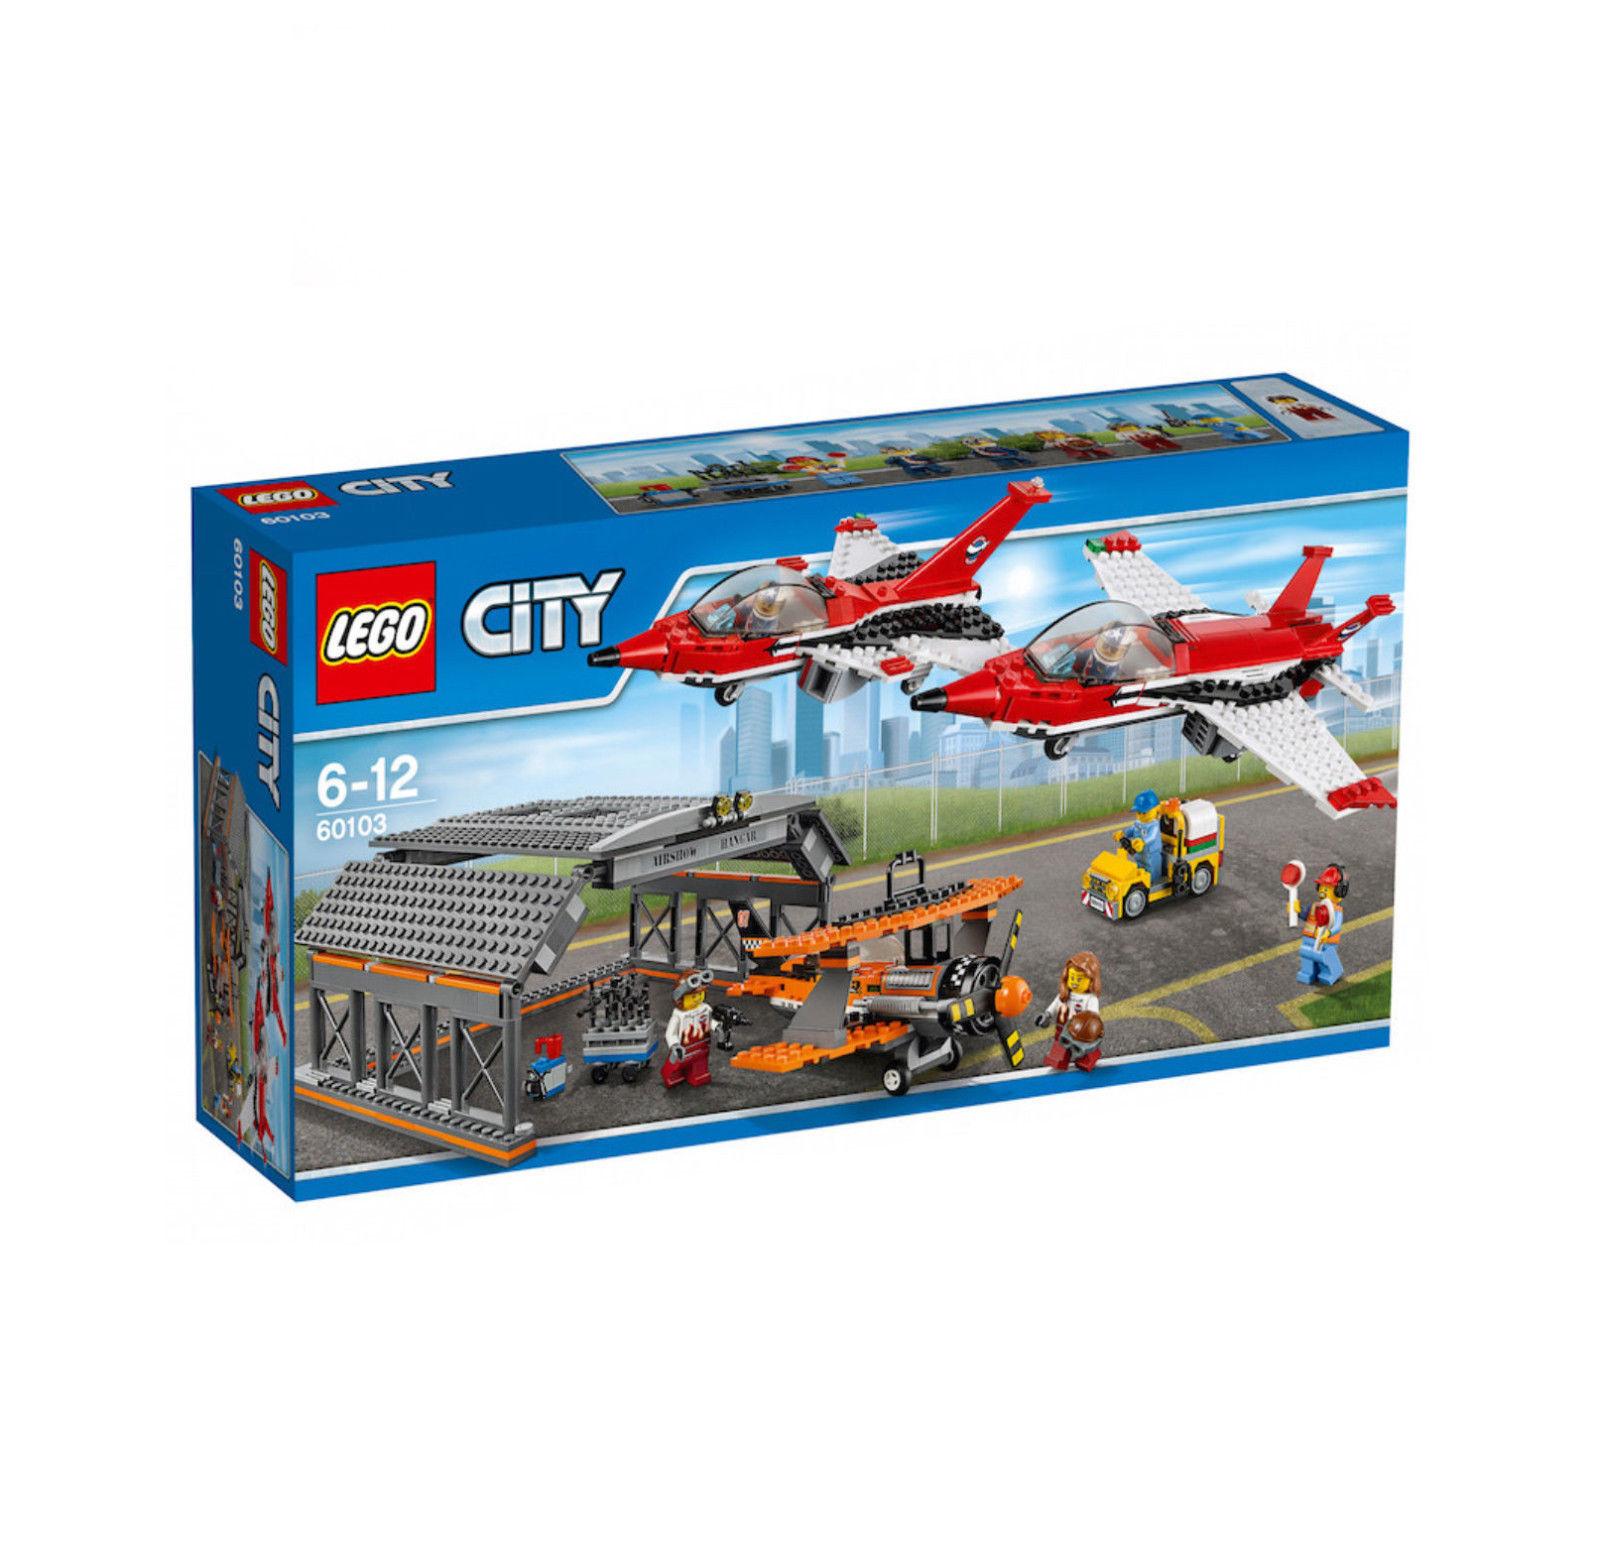 LEGO 60103 City Airport Air Show Construction Set - Multi-Coloured